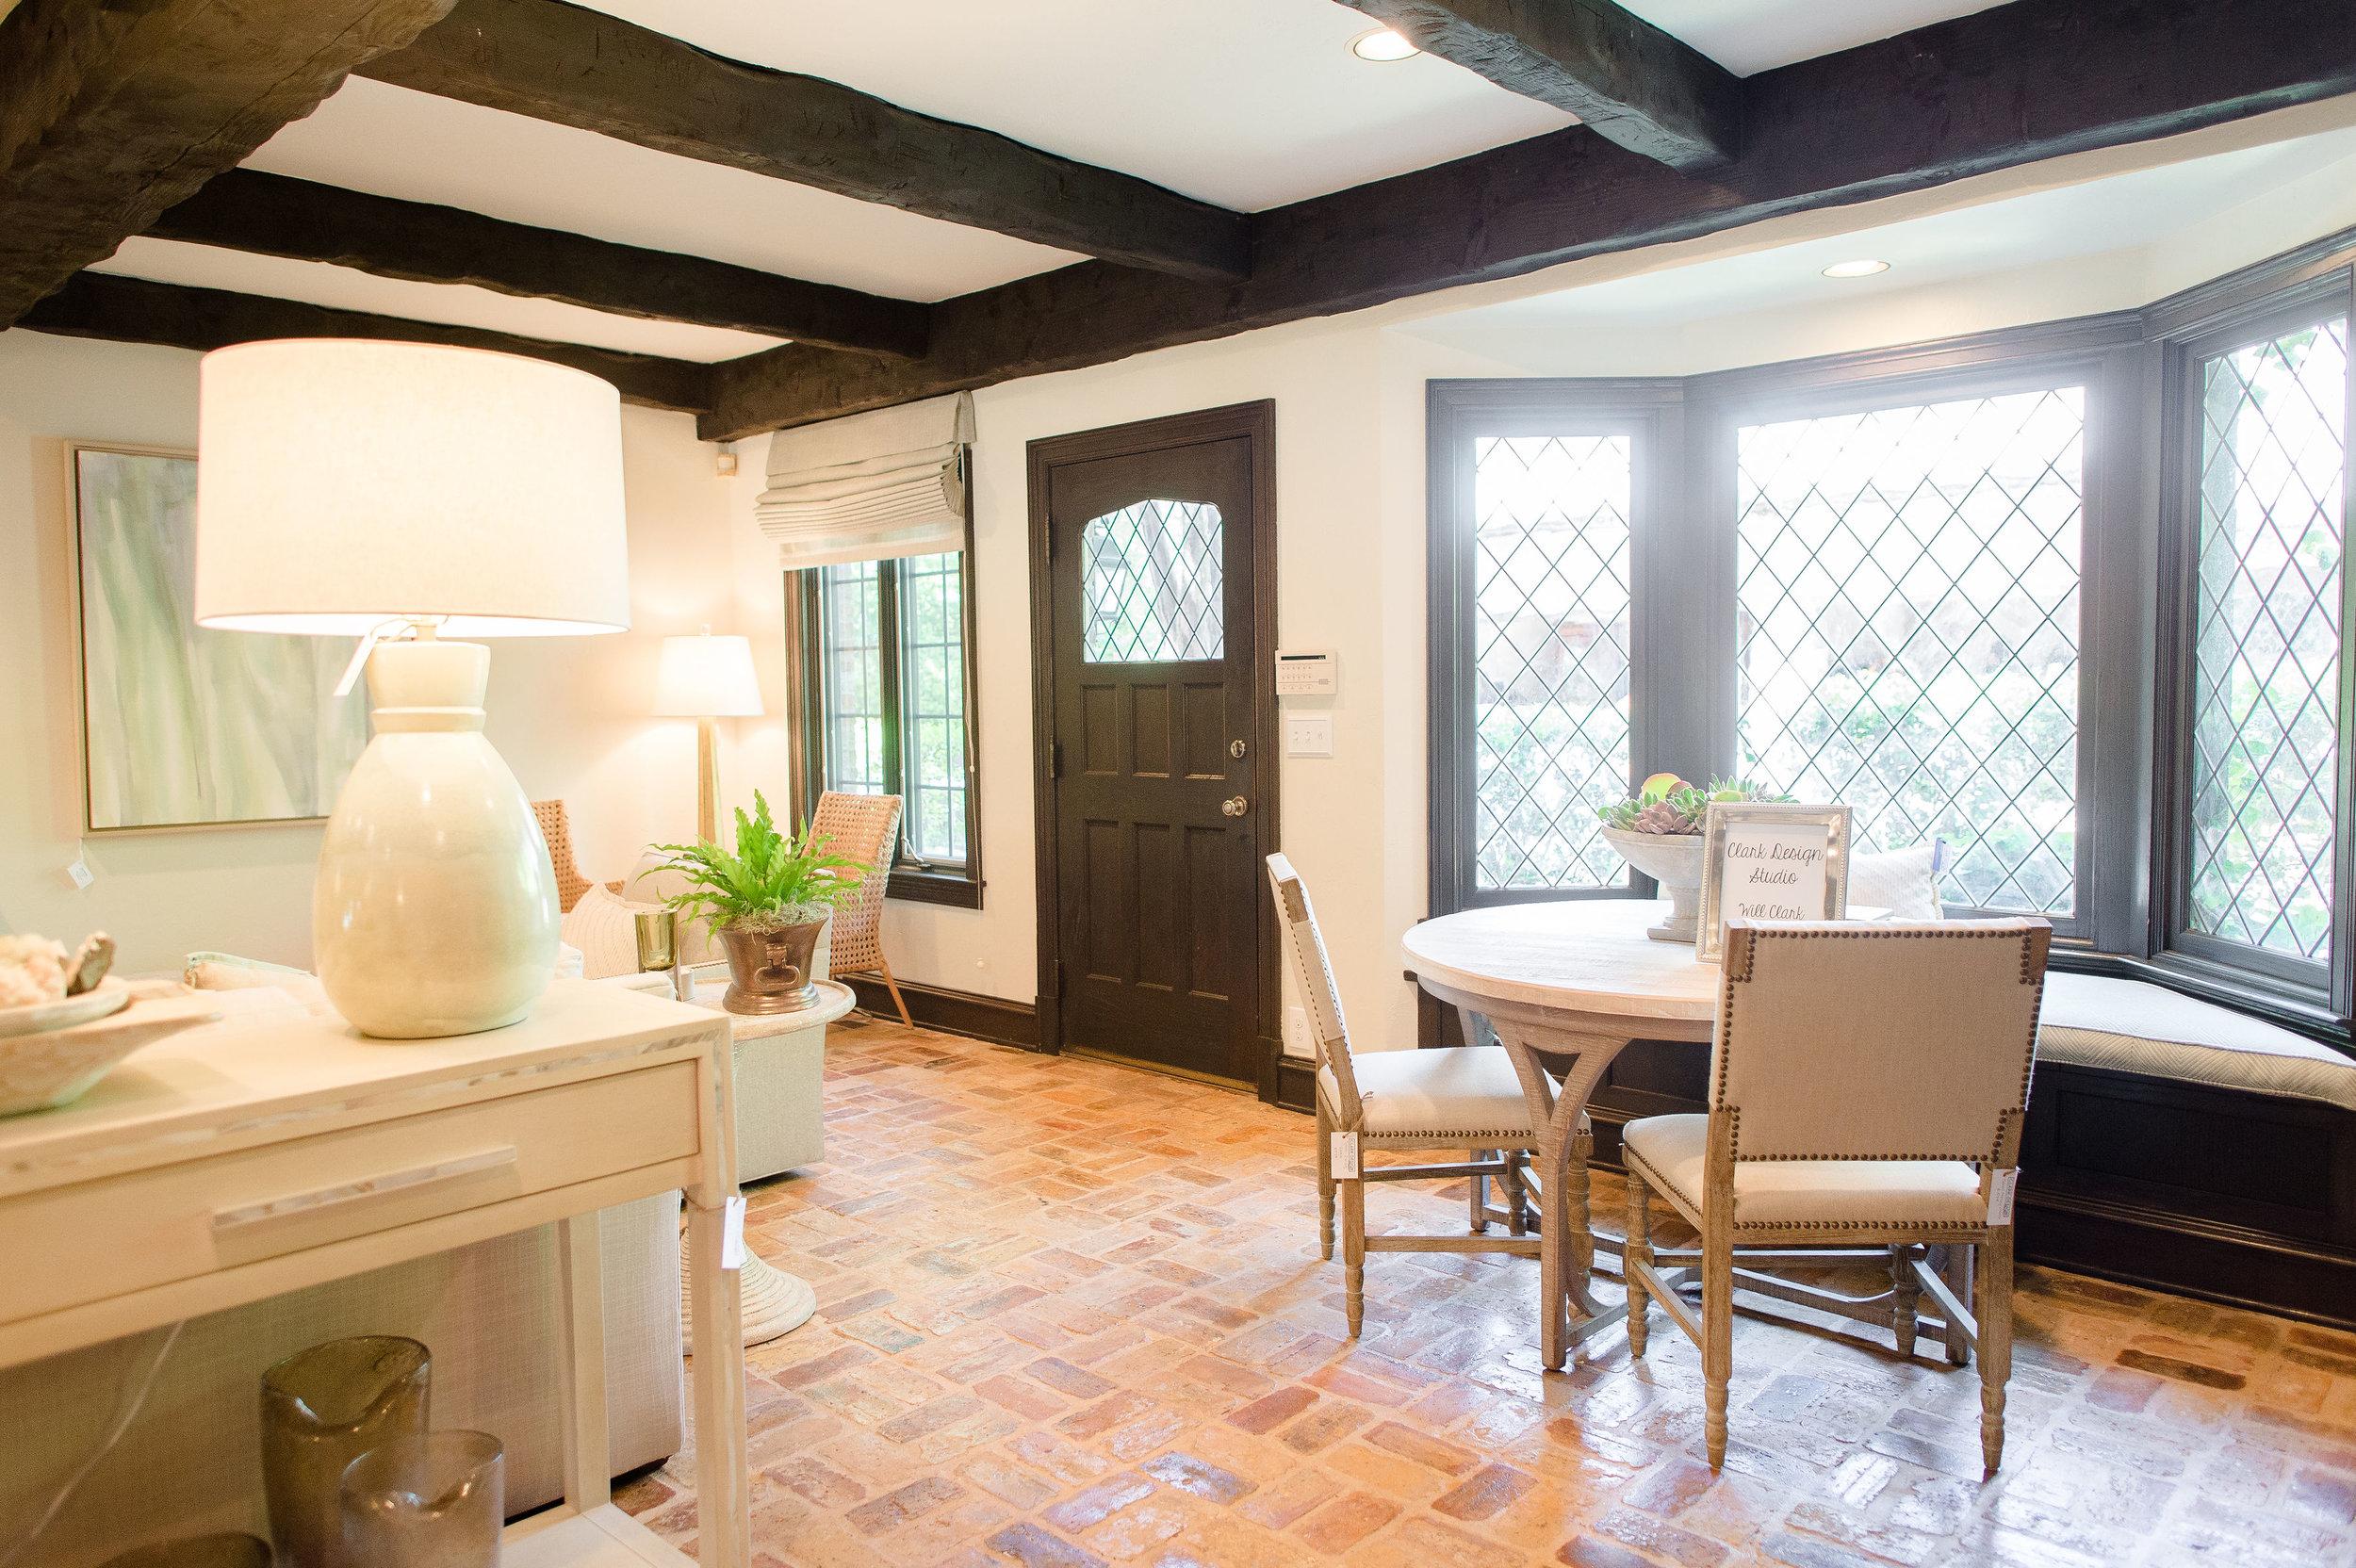 clark-design-studio-bay-window-coffered-ceiling.jpg